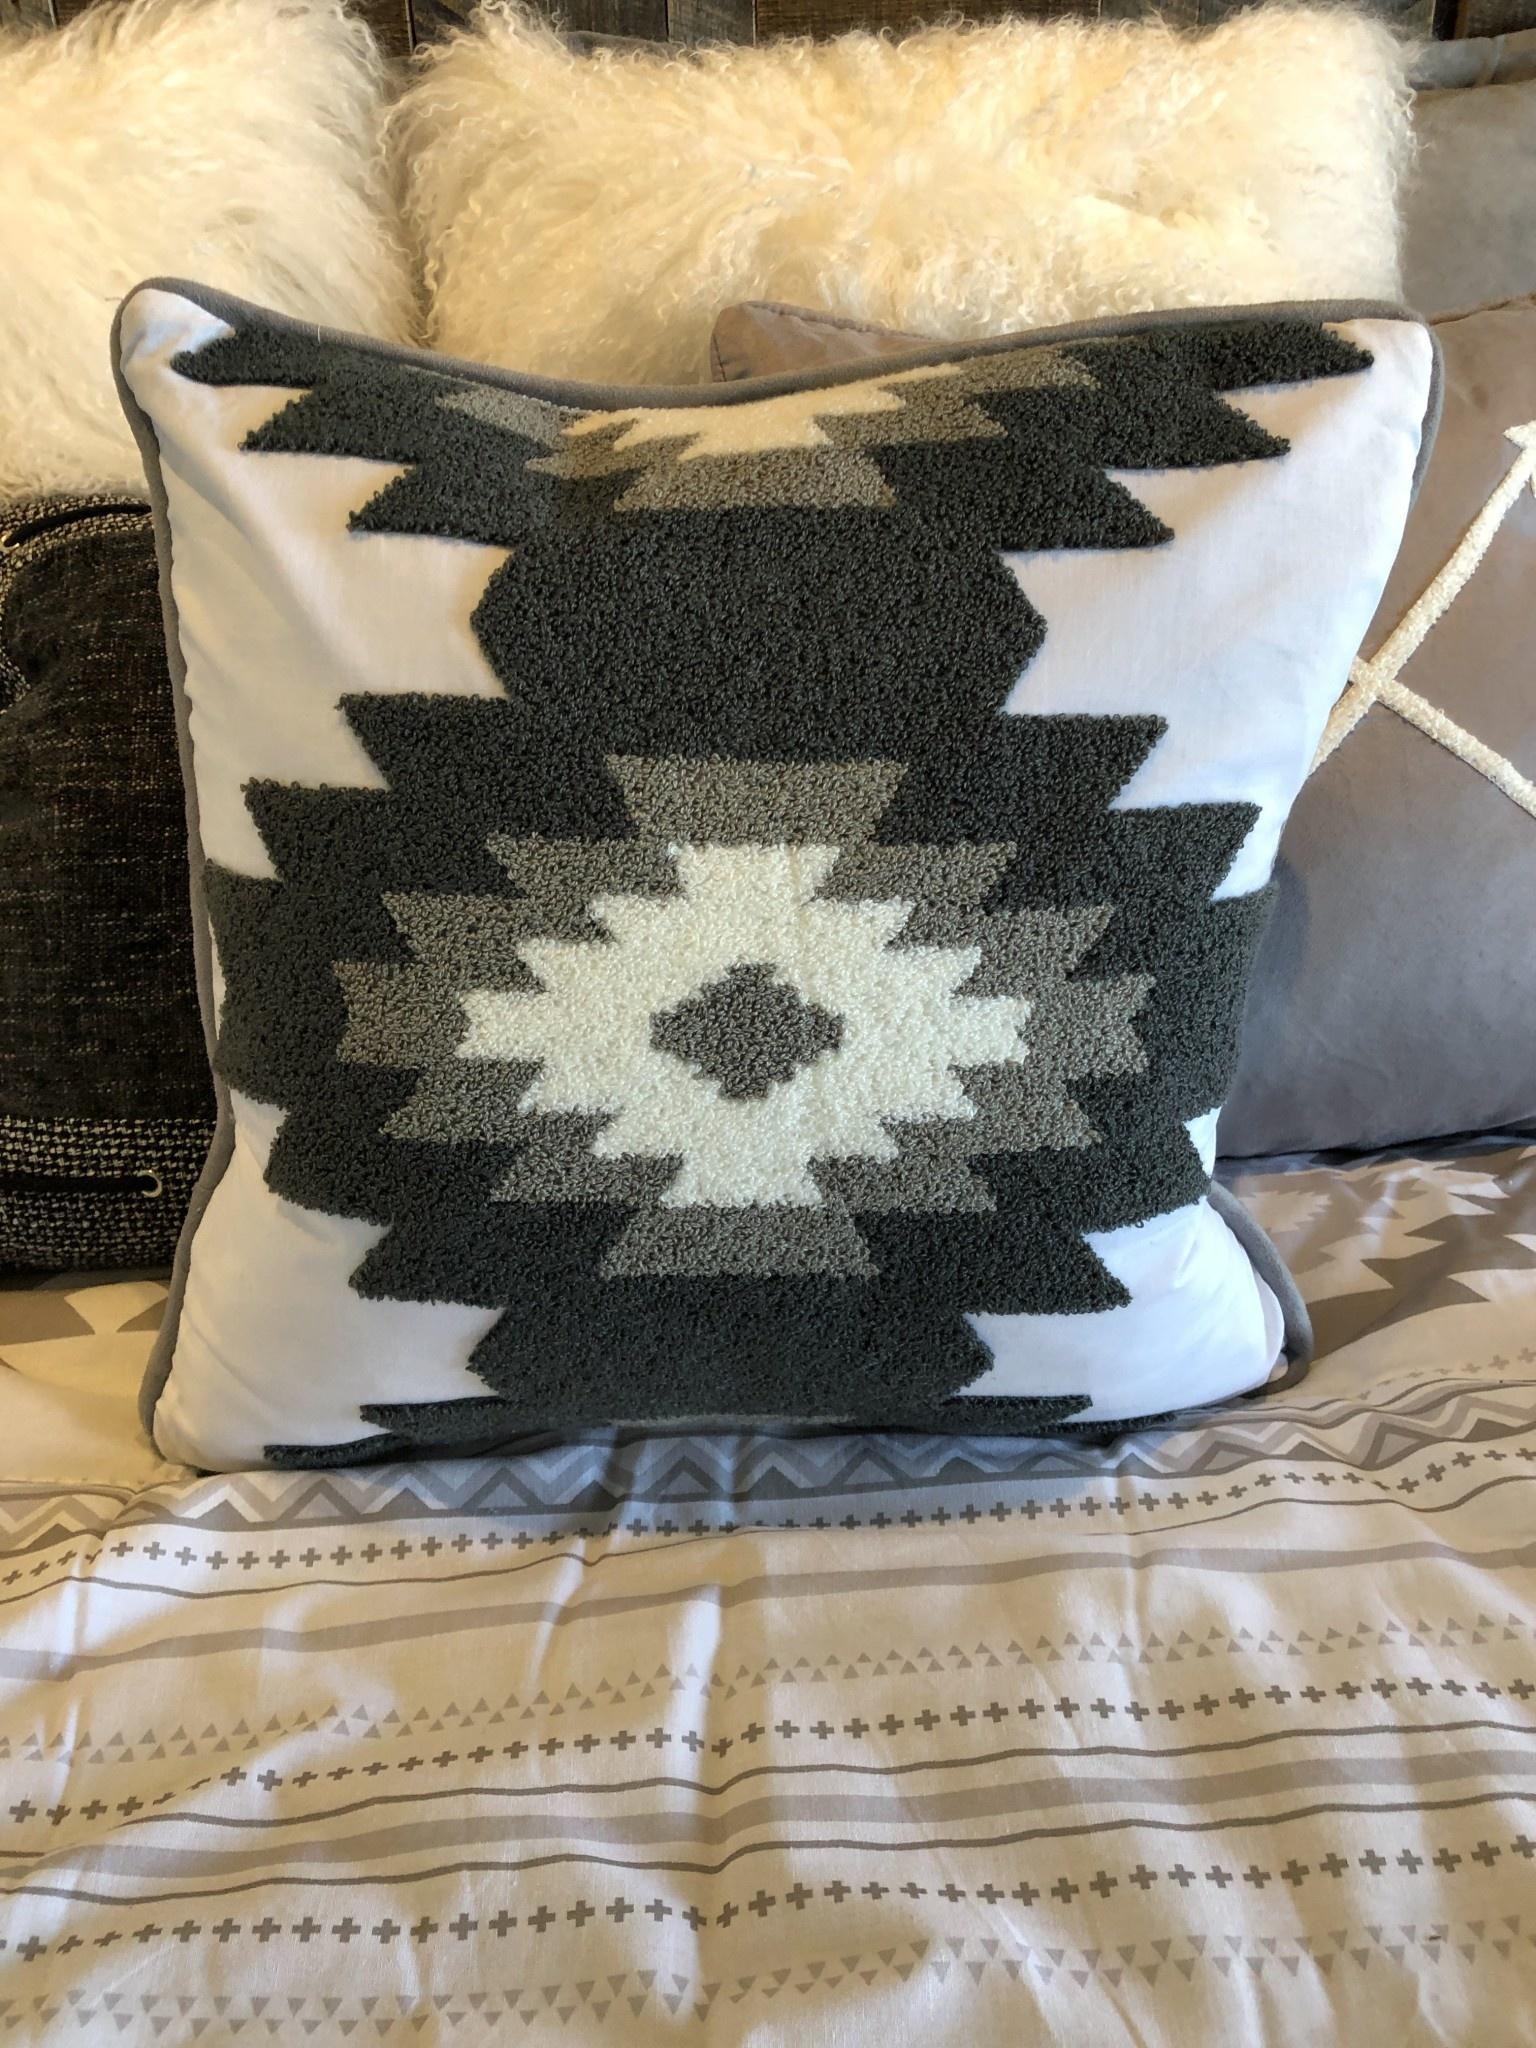 Hiend Free Spirit w/Crewel Embroidery Pillow 18x18